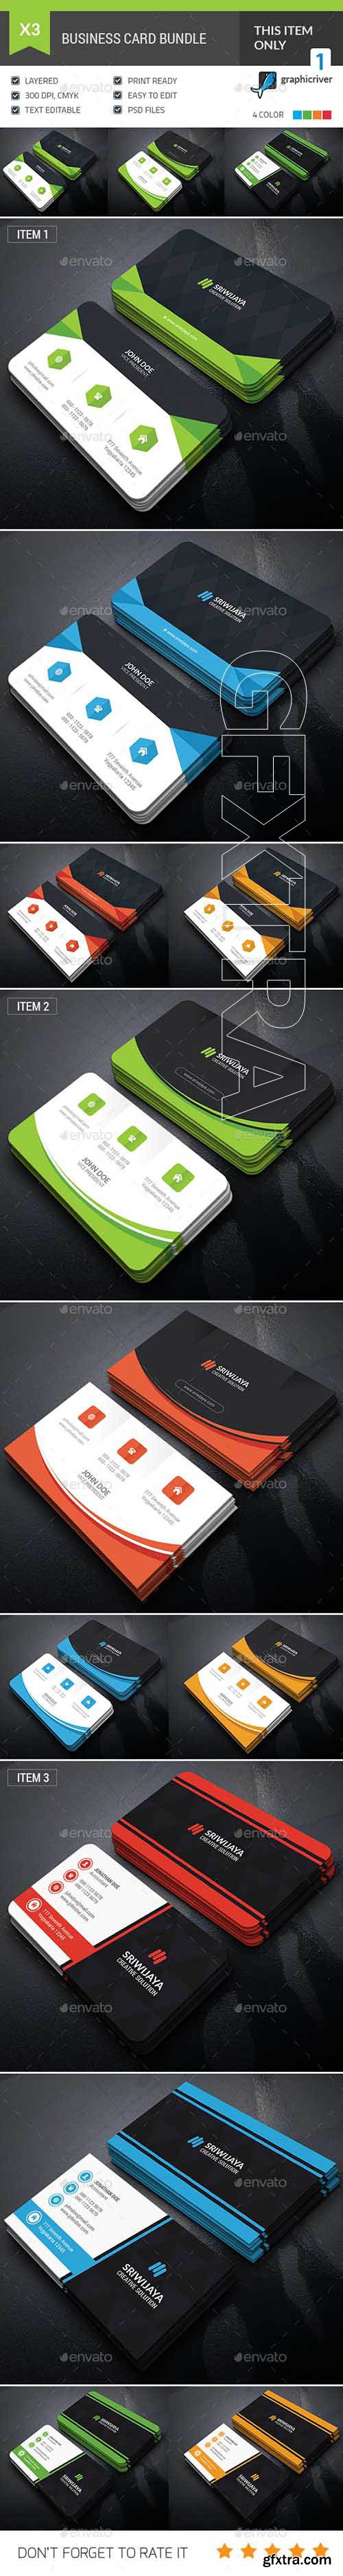 GraphicRiver - Professional Business Card Bundle 20809953